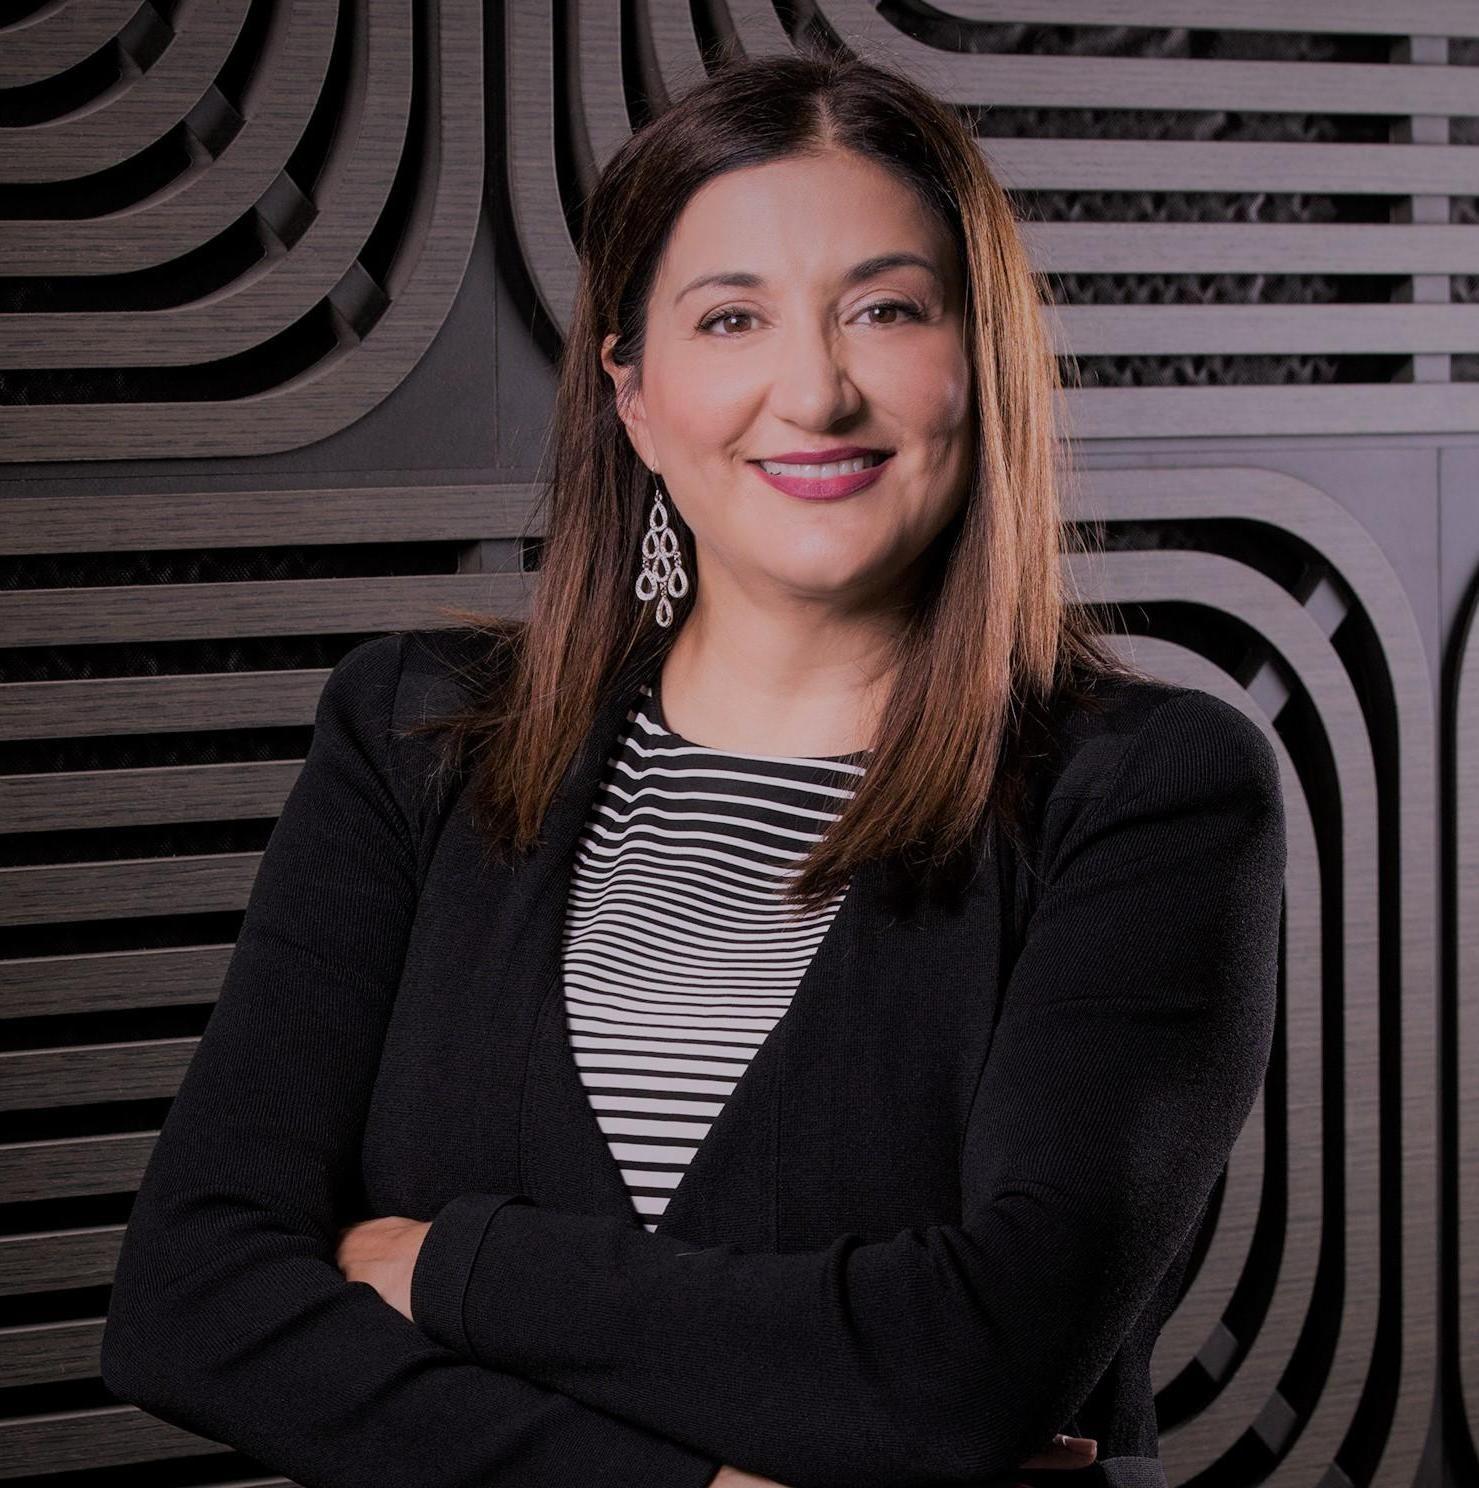 Lisa Annese